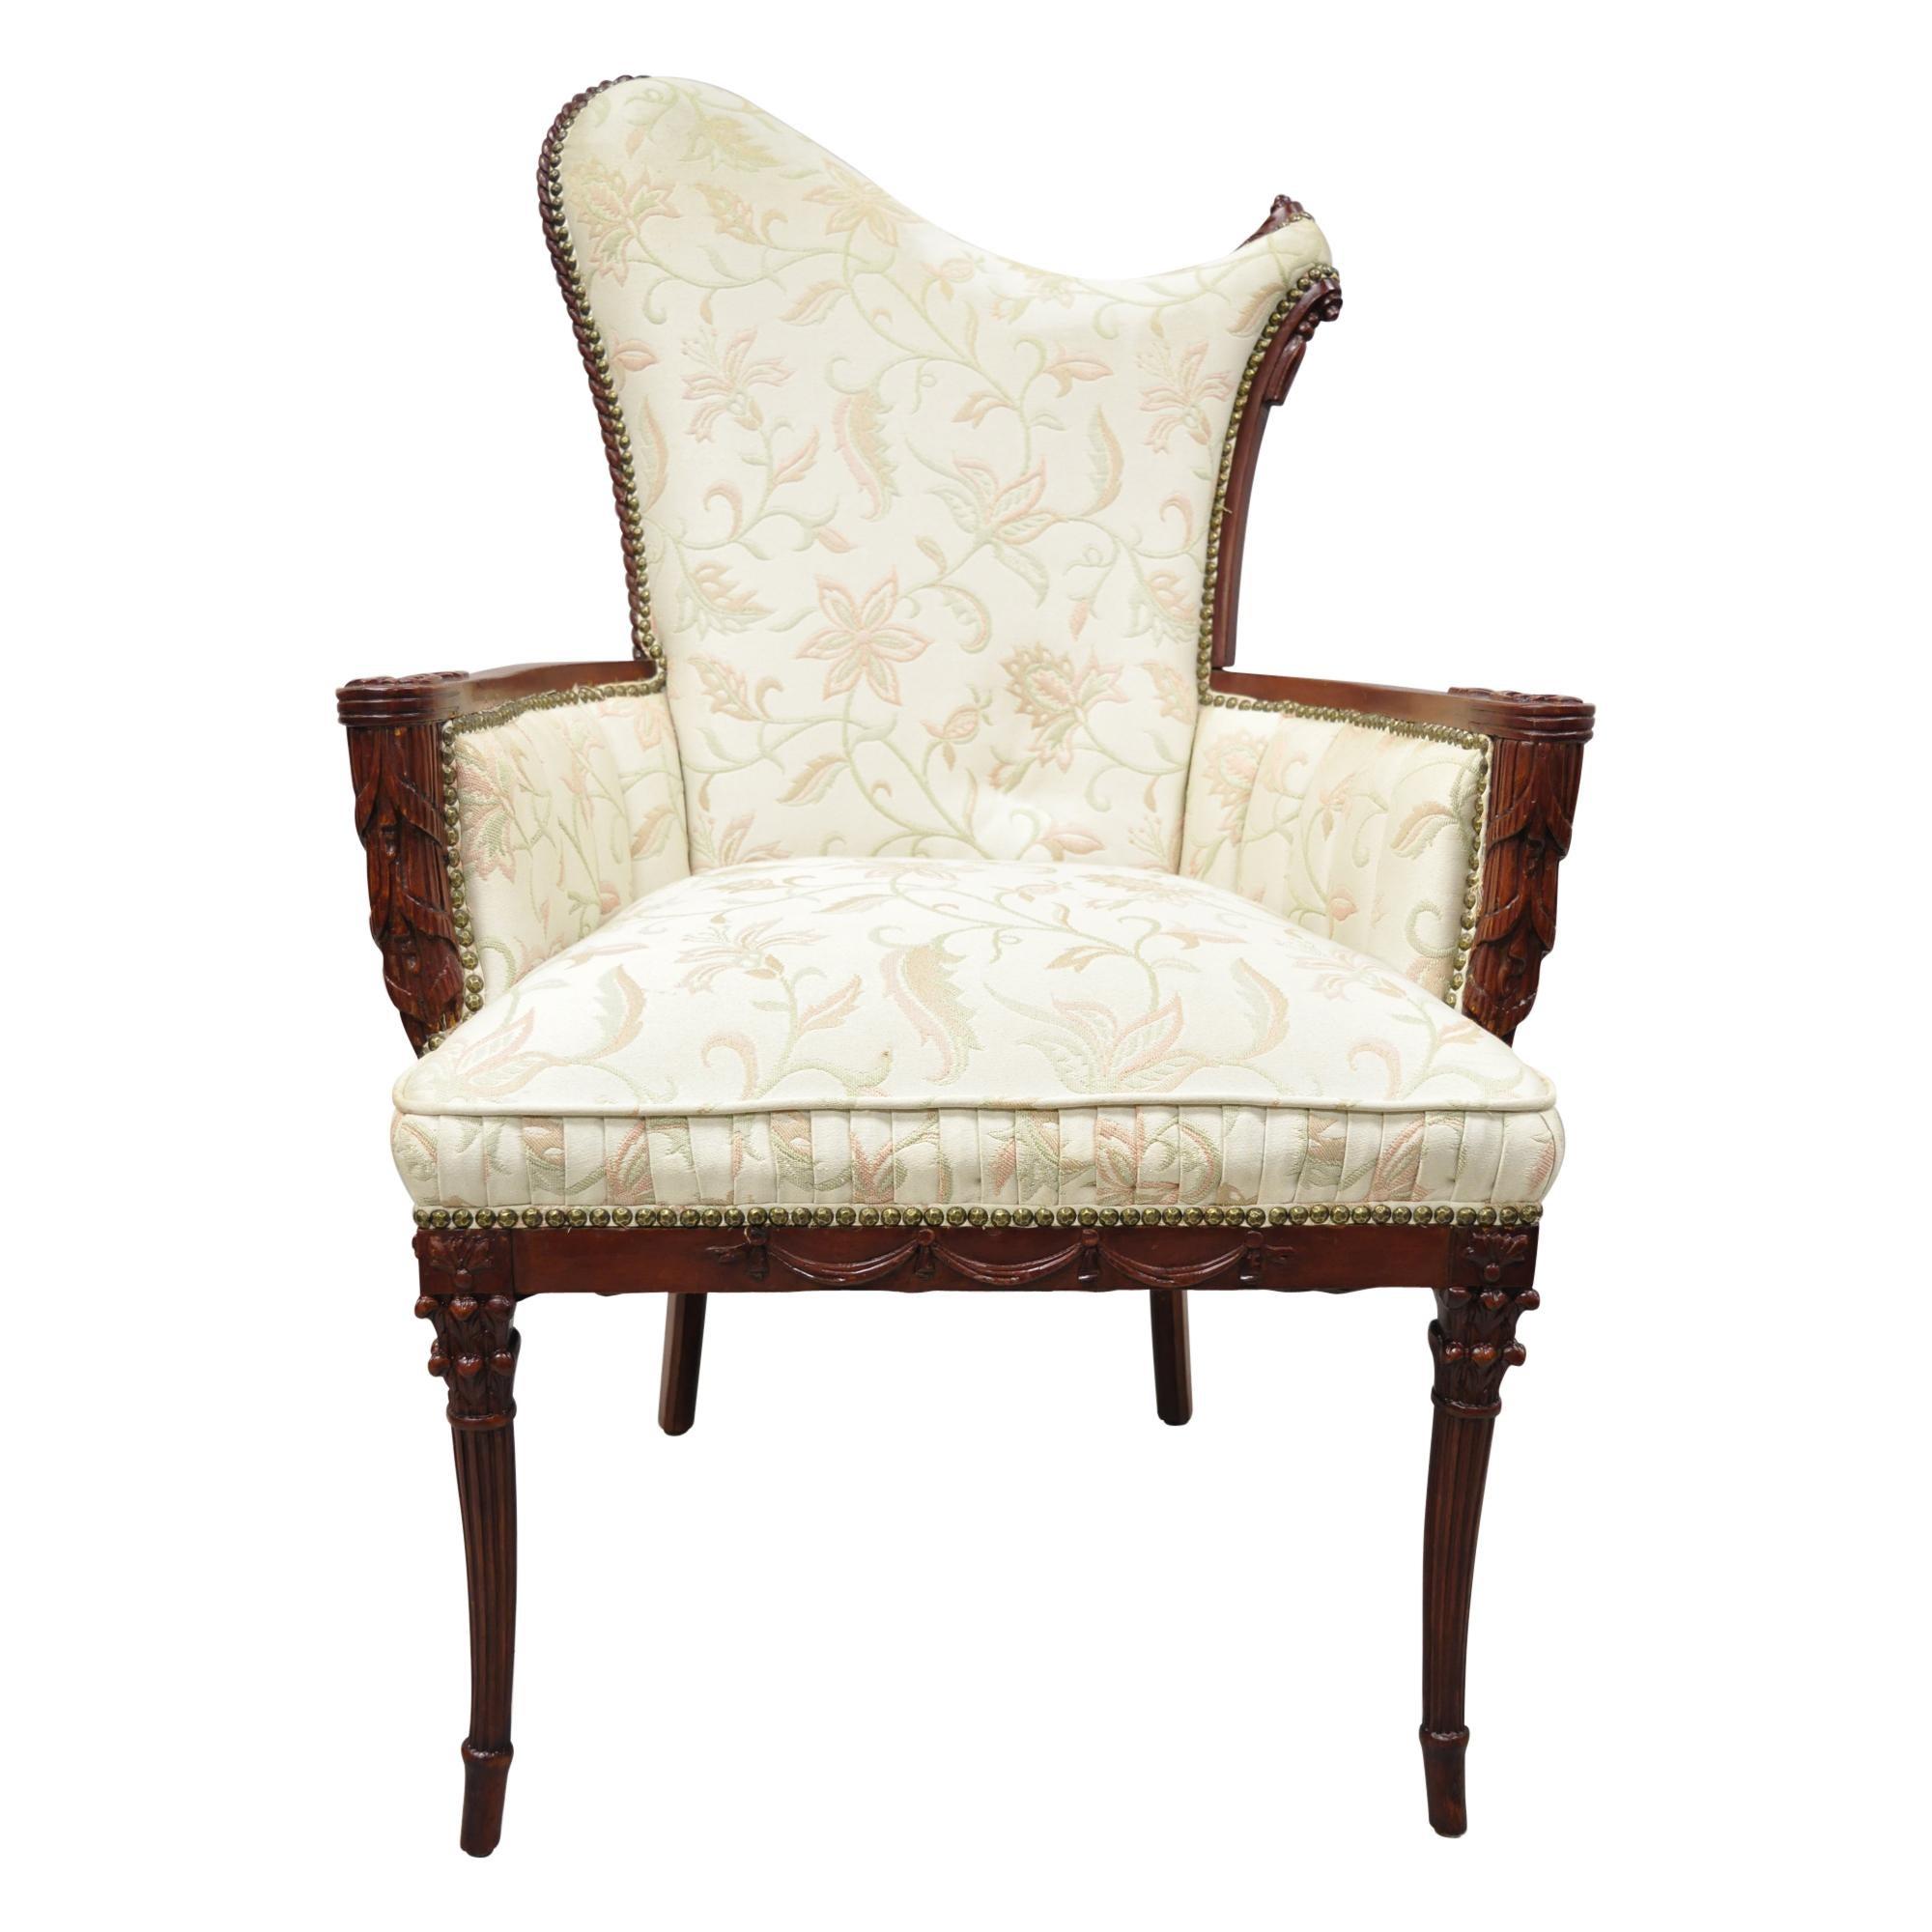 French Hollywood Regency Dorothy Draper Style Tassel Fireside Mahogany Armchair